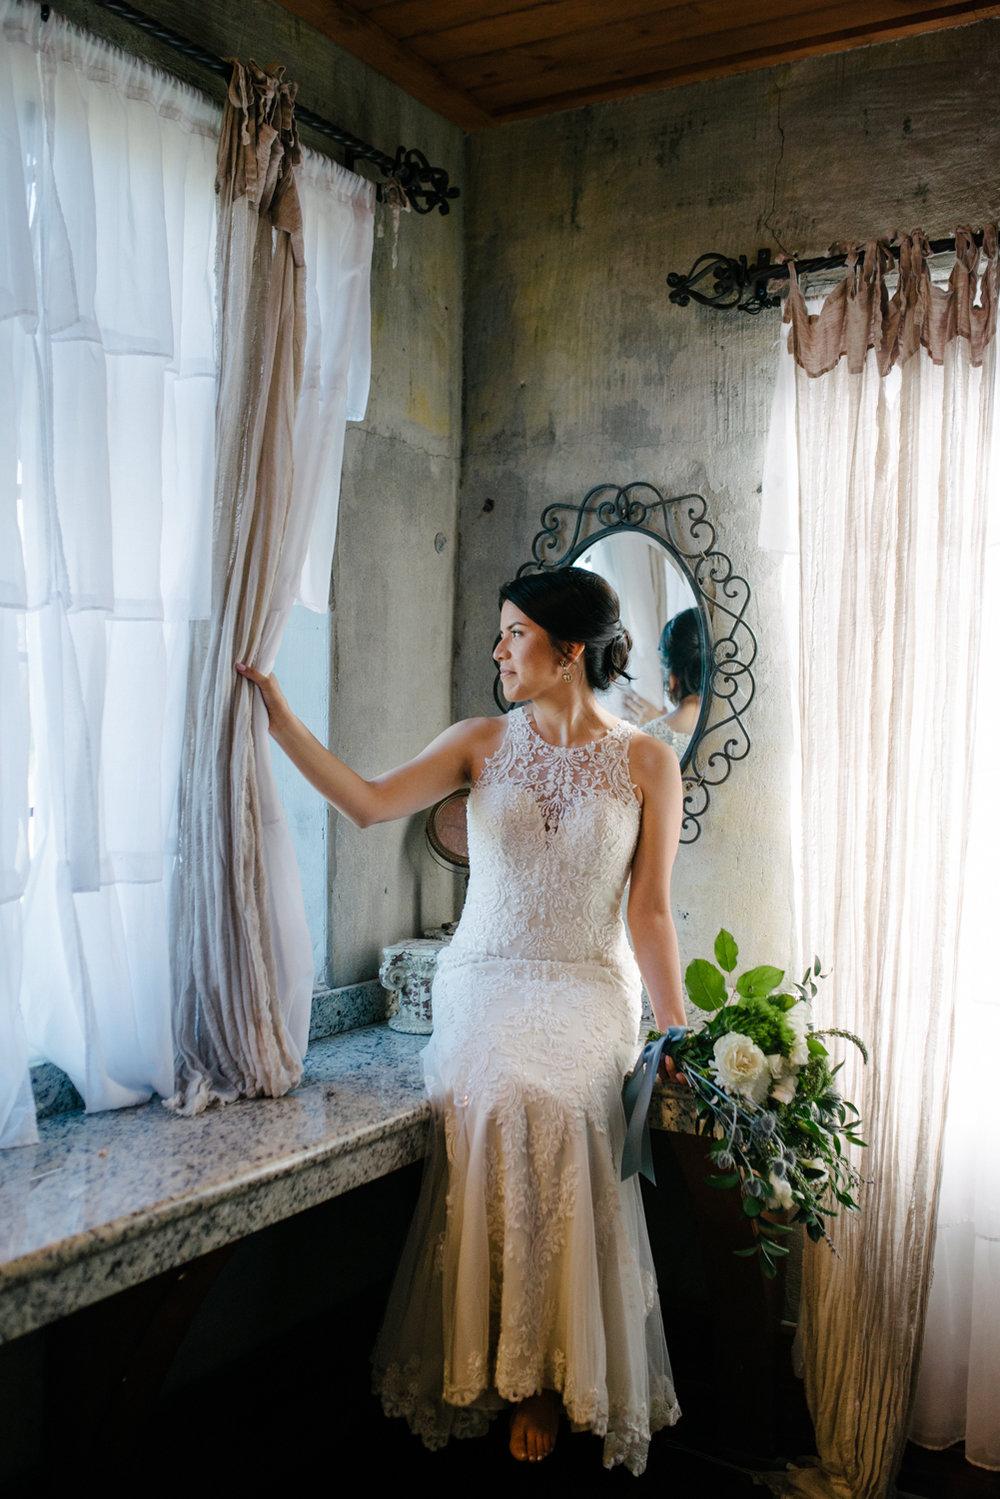 casperwedding-texasweddings-houstonweddings-oldedobbestation-montgomerytx-montgomeryweddings-bride-groom-bridalparty-weddingdress-24.jpg